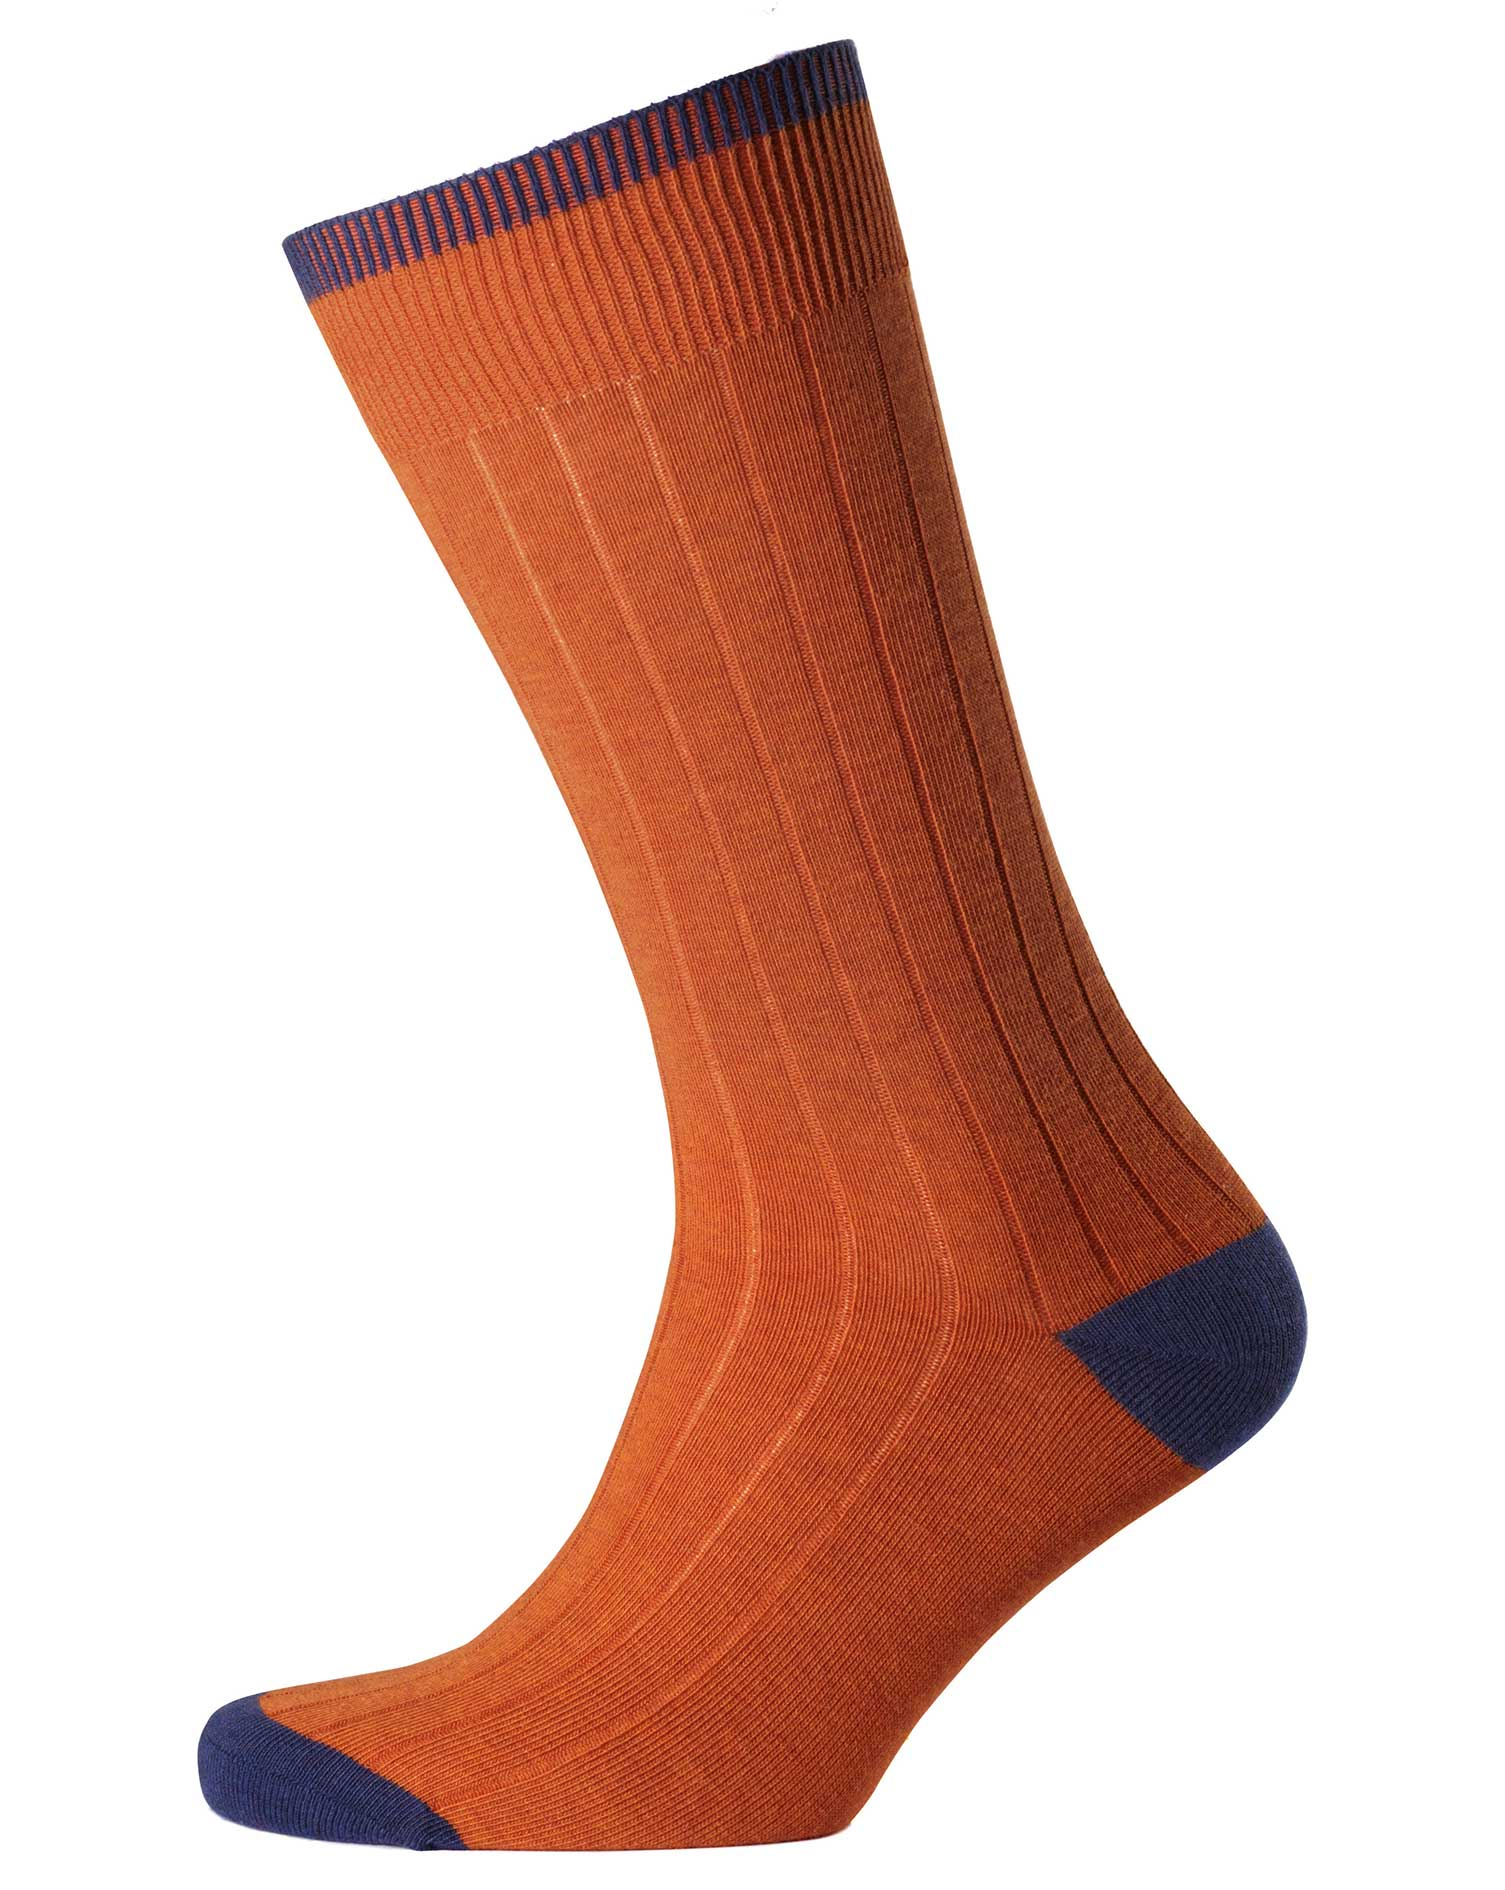 Orange Ribbed Socks Size Medium by Charles Tyrwhitt